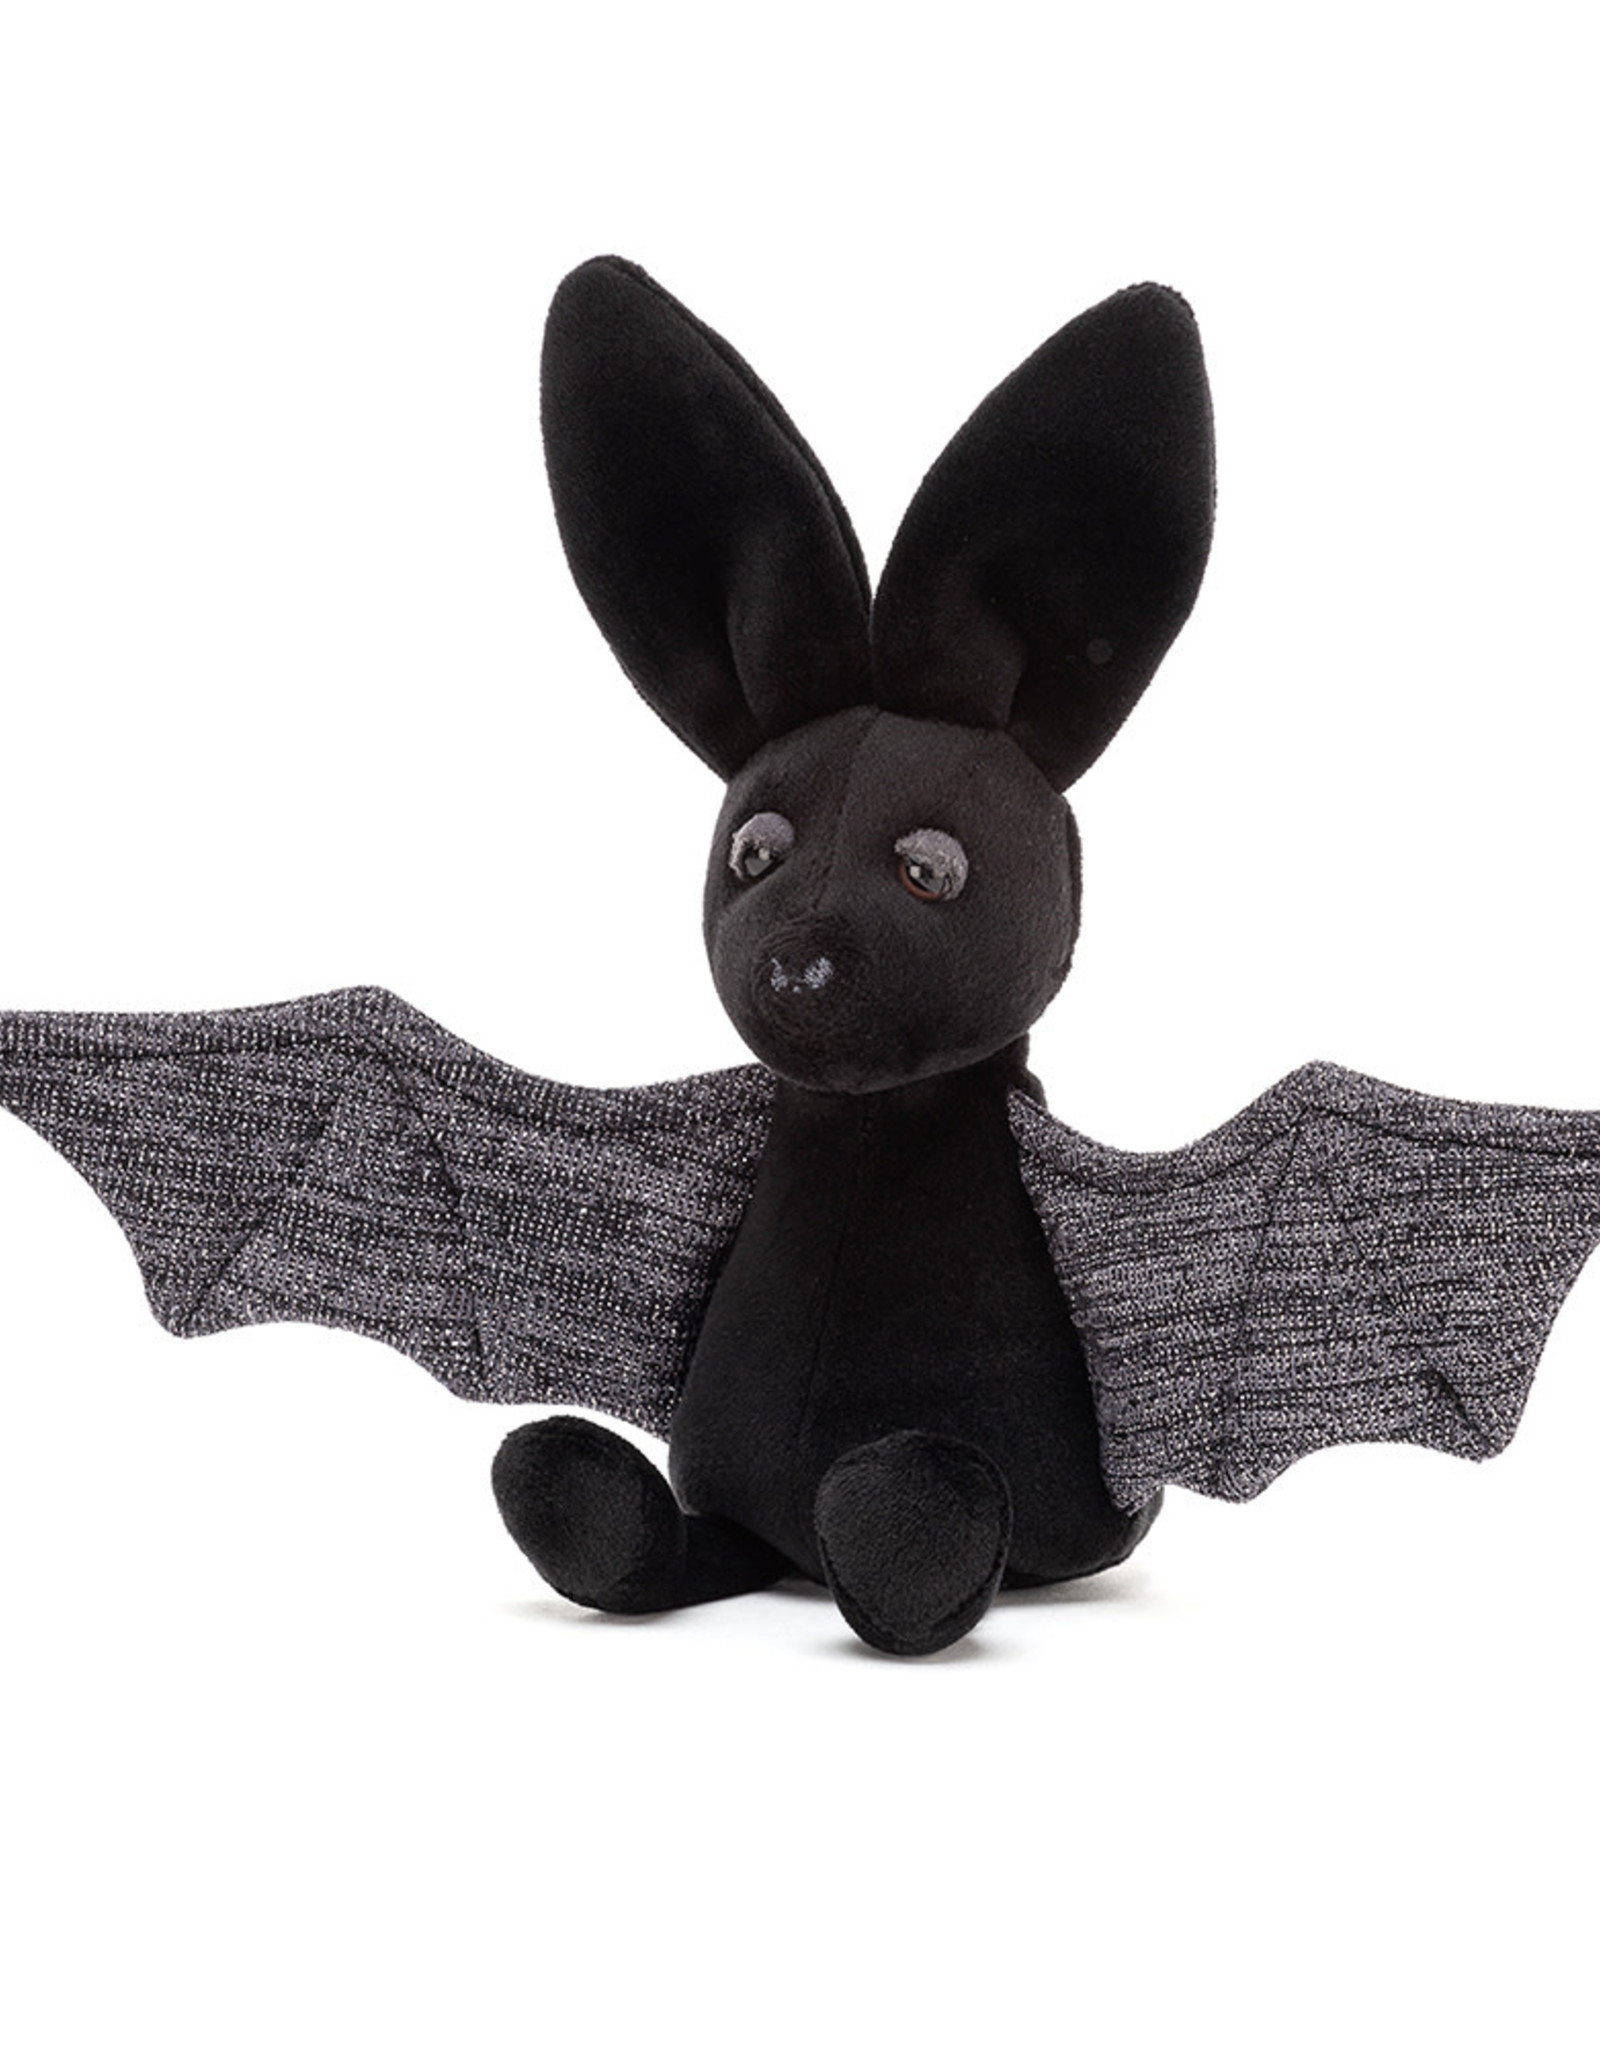 JellyCat Jellycat Onyx Bat